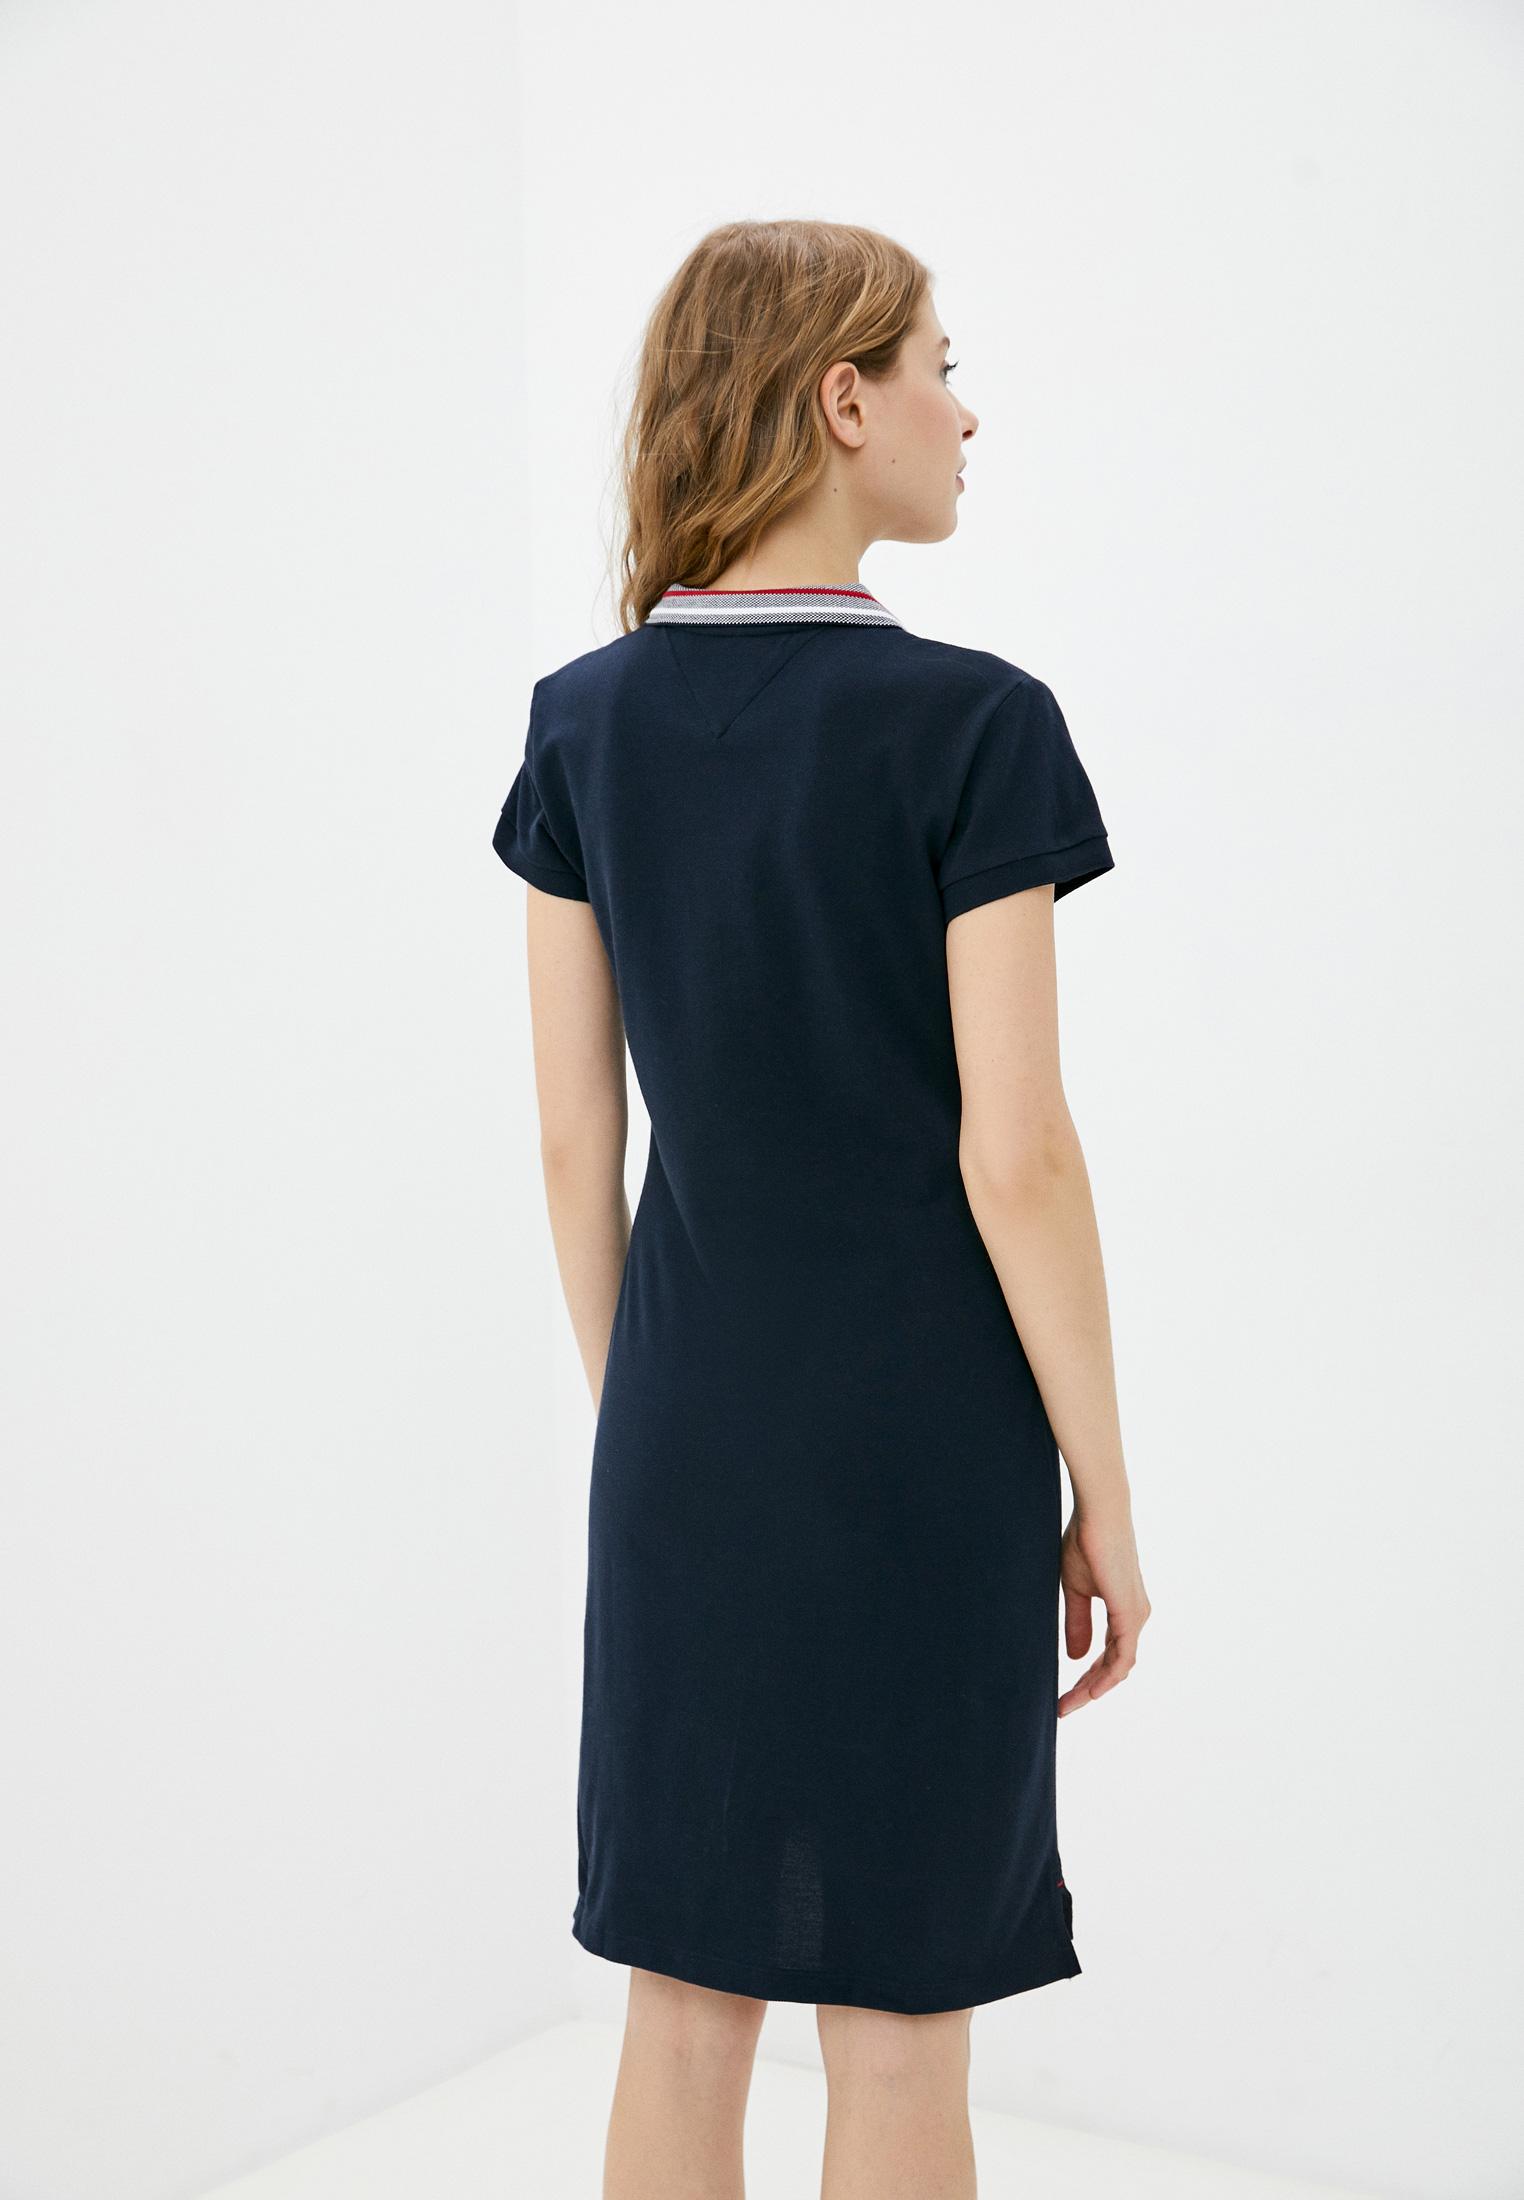 Платье Tommy Hilfiger (Томми Хилфигер) WW0WW30502: изображение 3